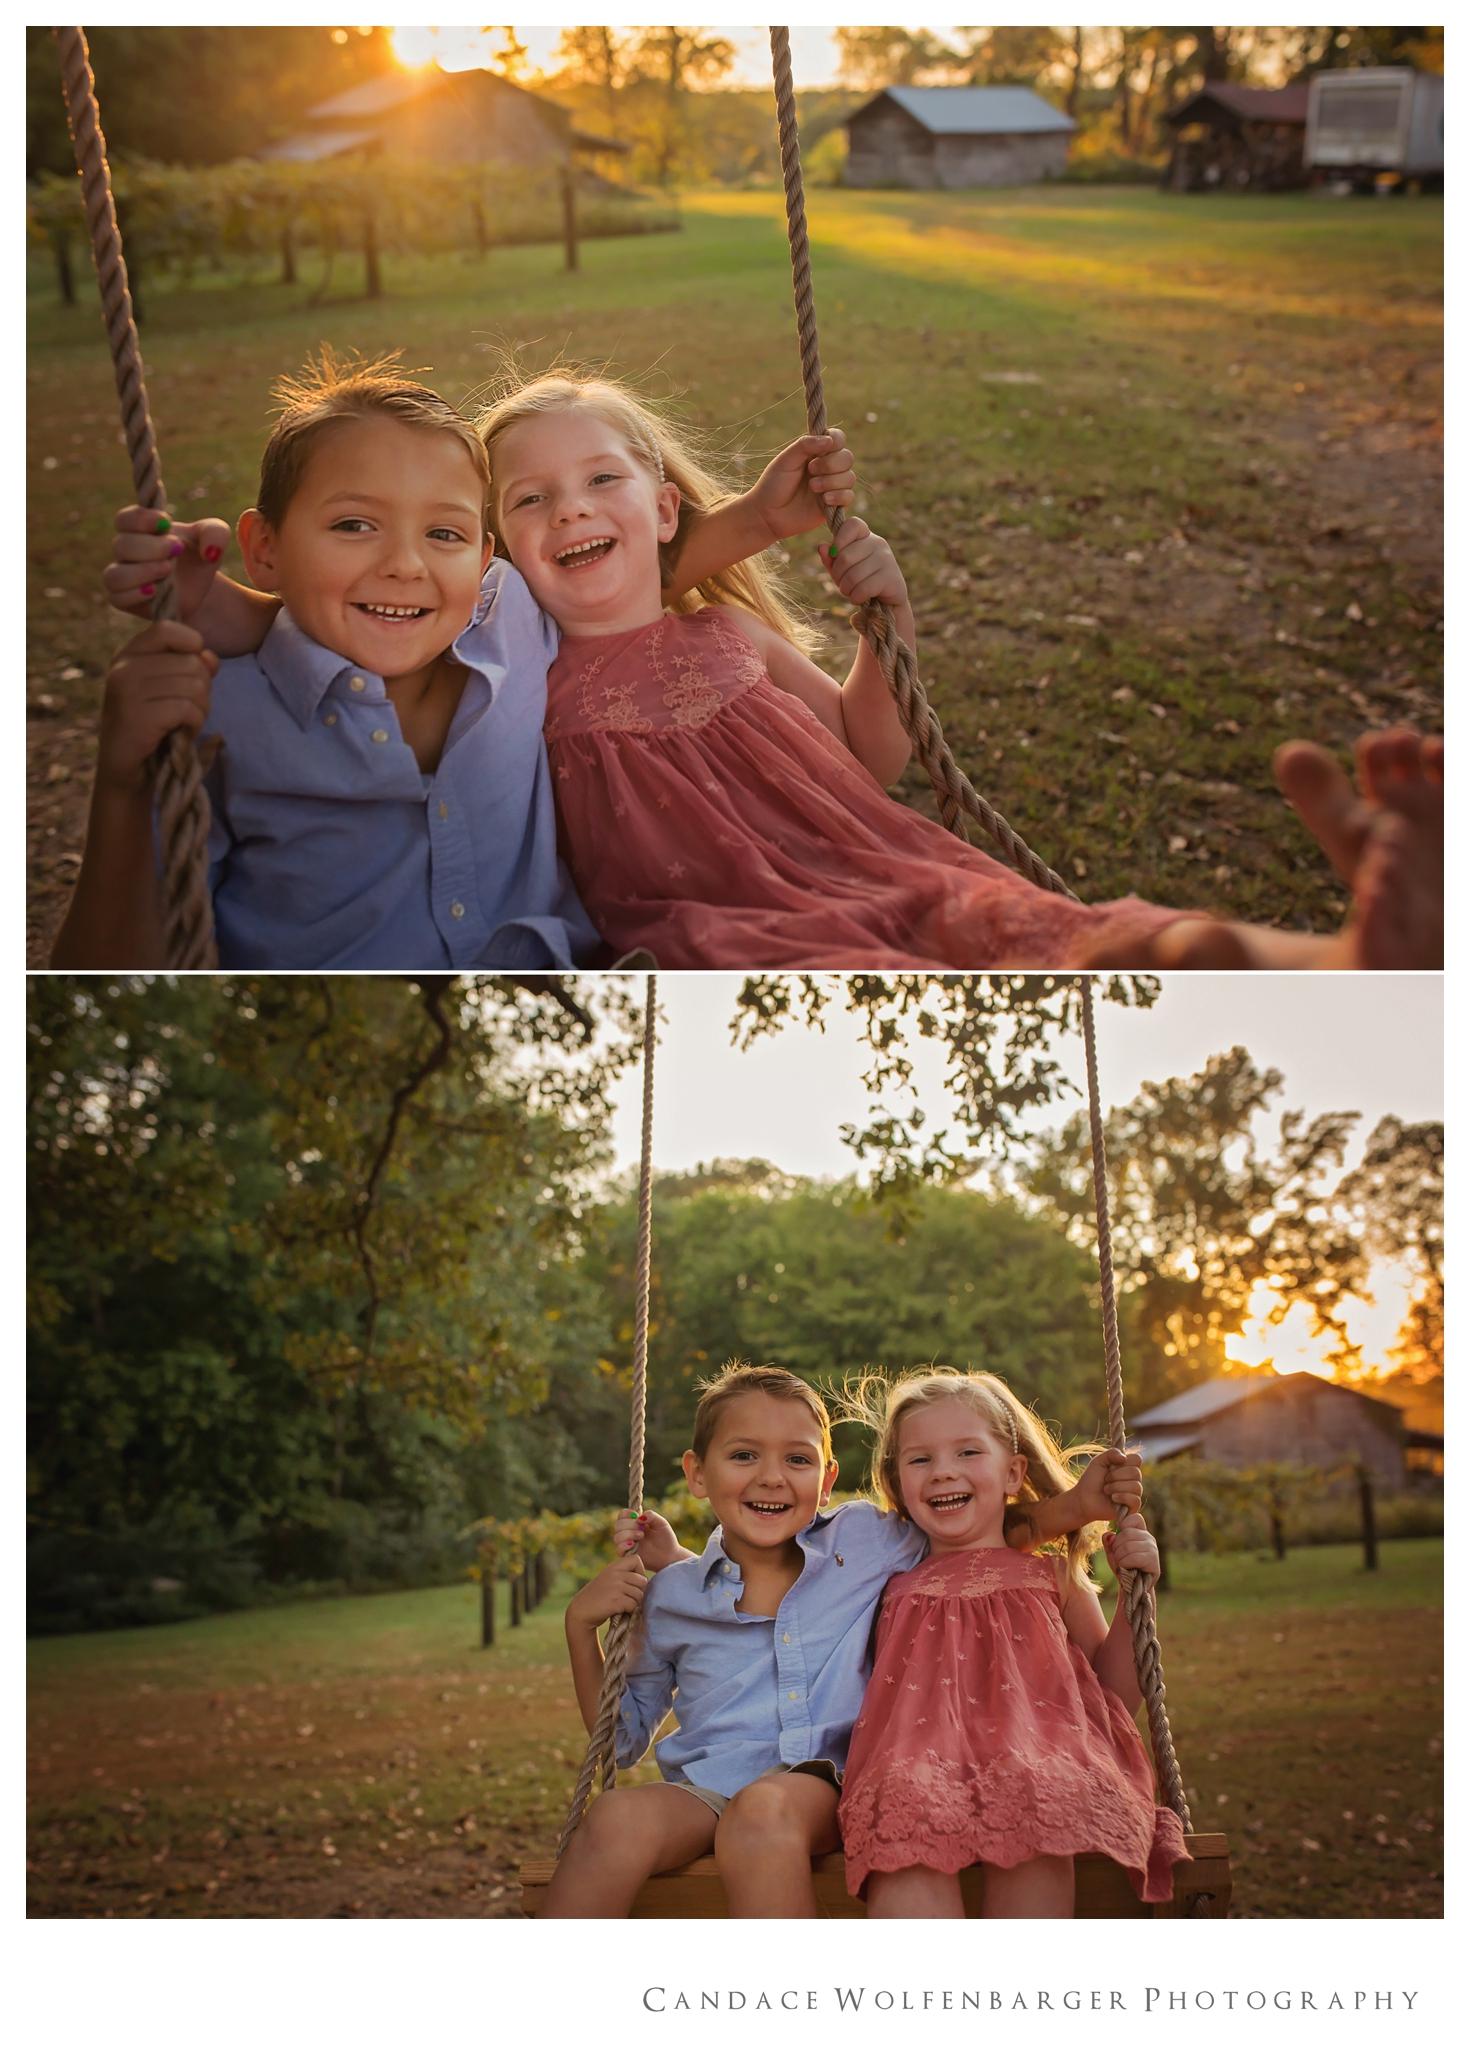 Naaman Caroline Swing Session Candace Wolfenbarger Sanford NC Childrens Photographer 2.jpg